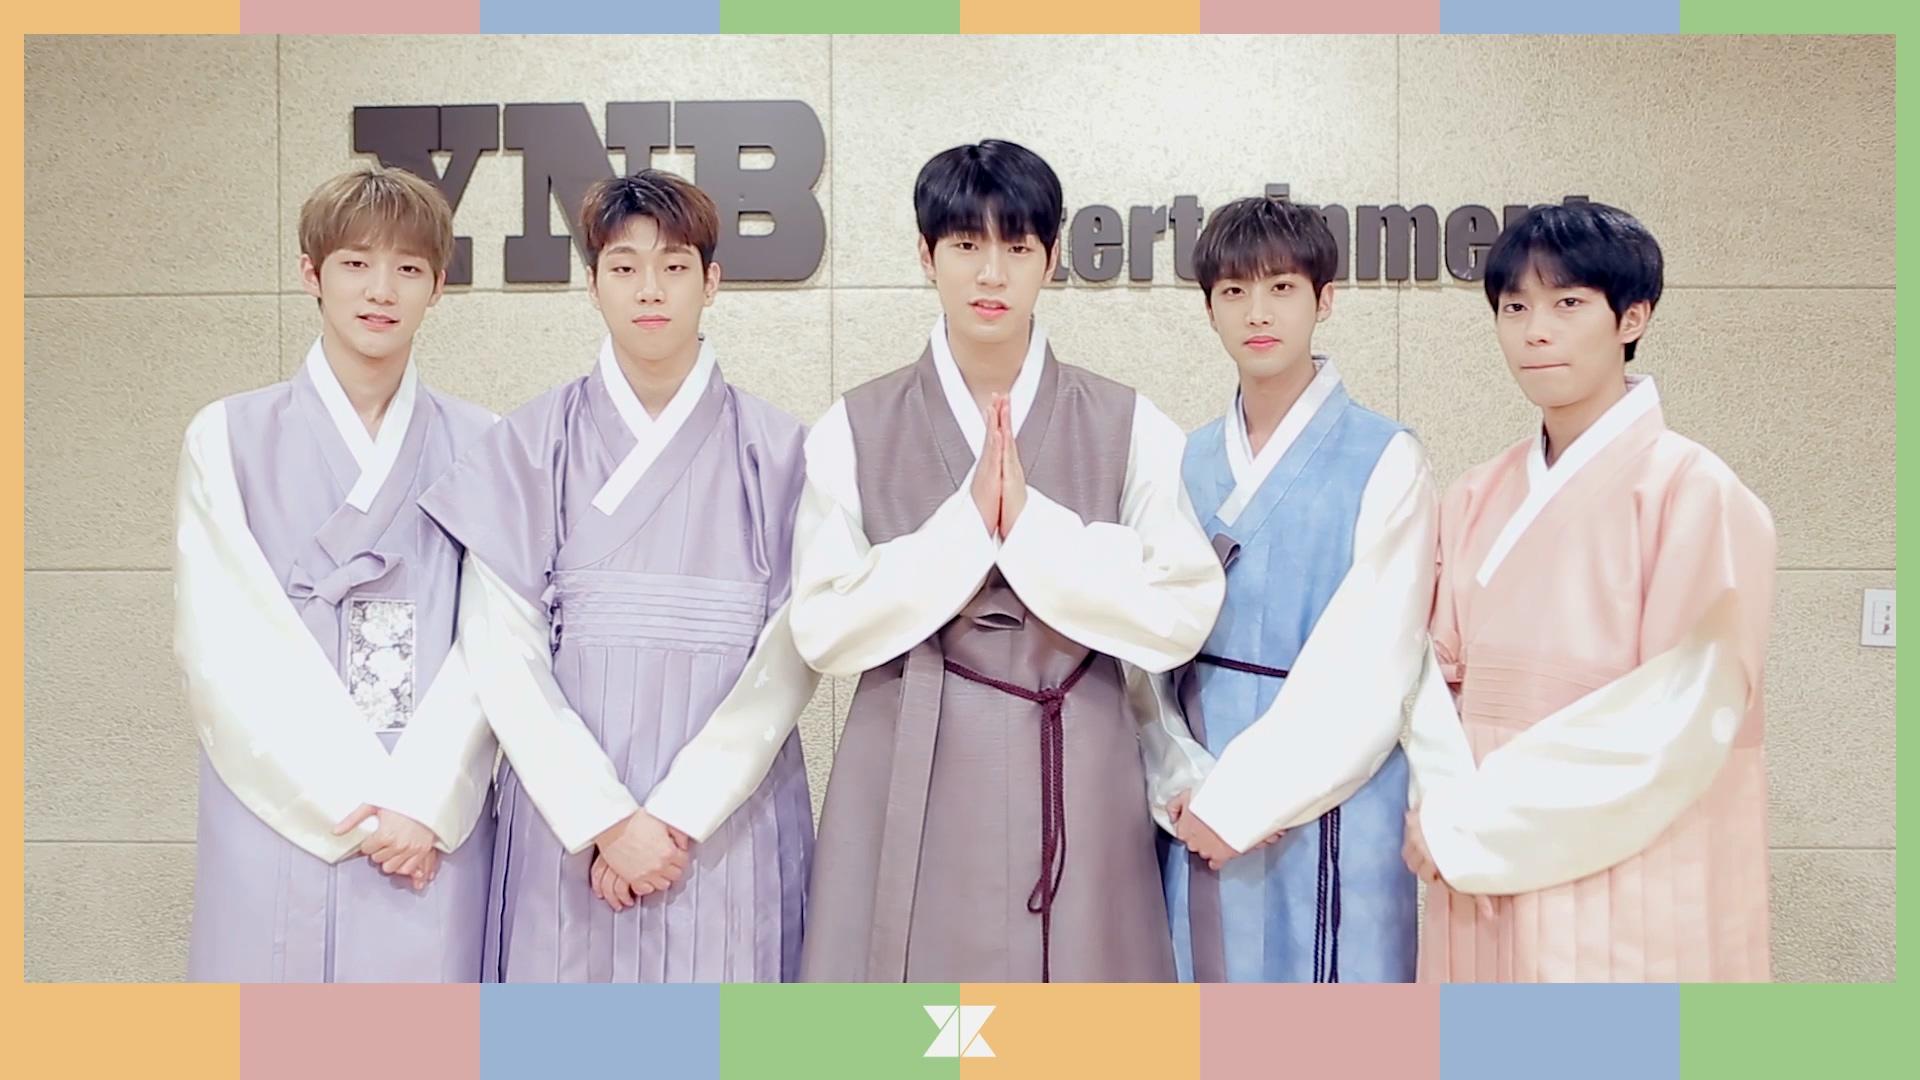 2018 Happy New Year♥ 크나큰 복 많이 받으세요~!